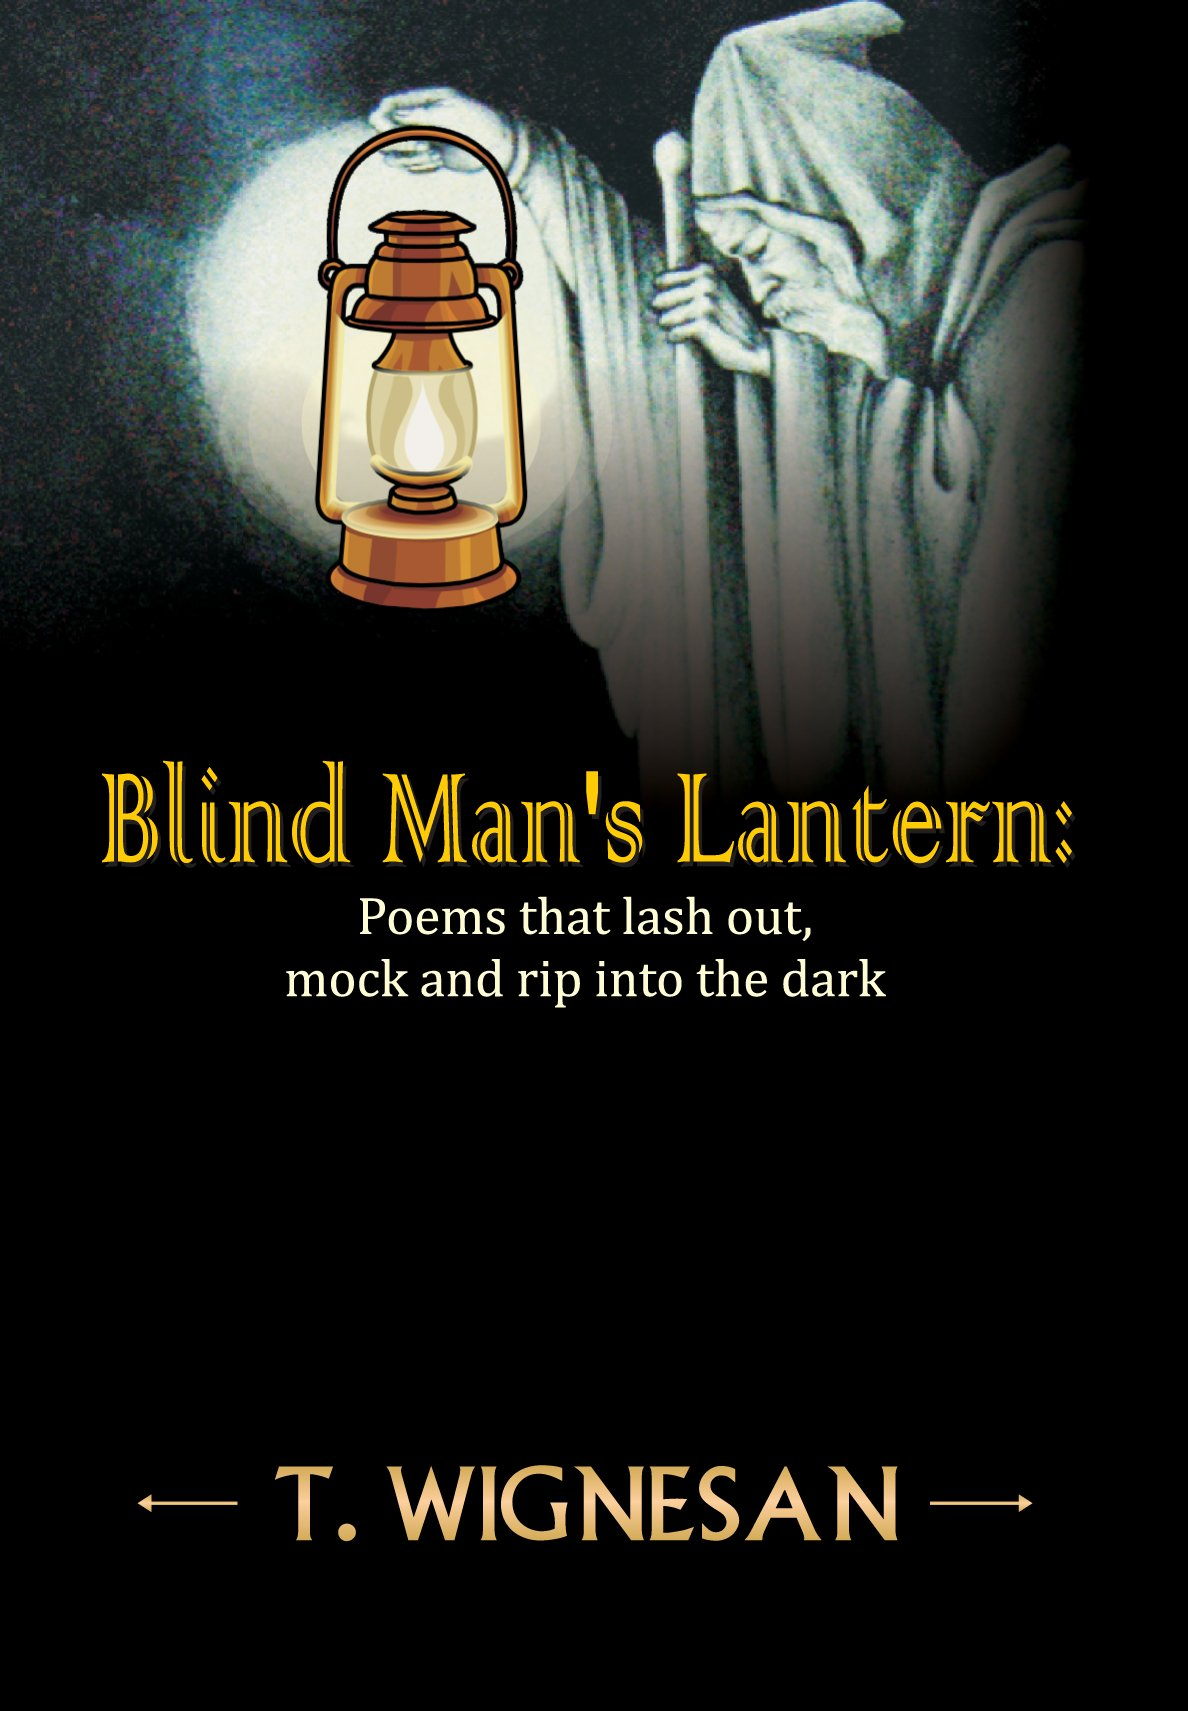 Blind Man's Lantern: T. Wignesan